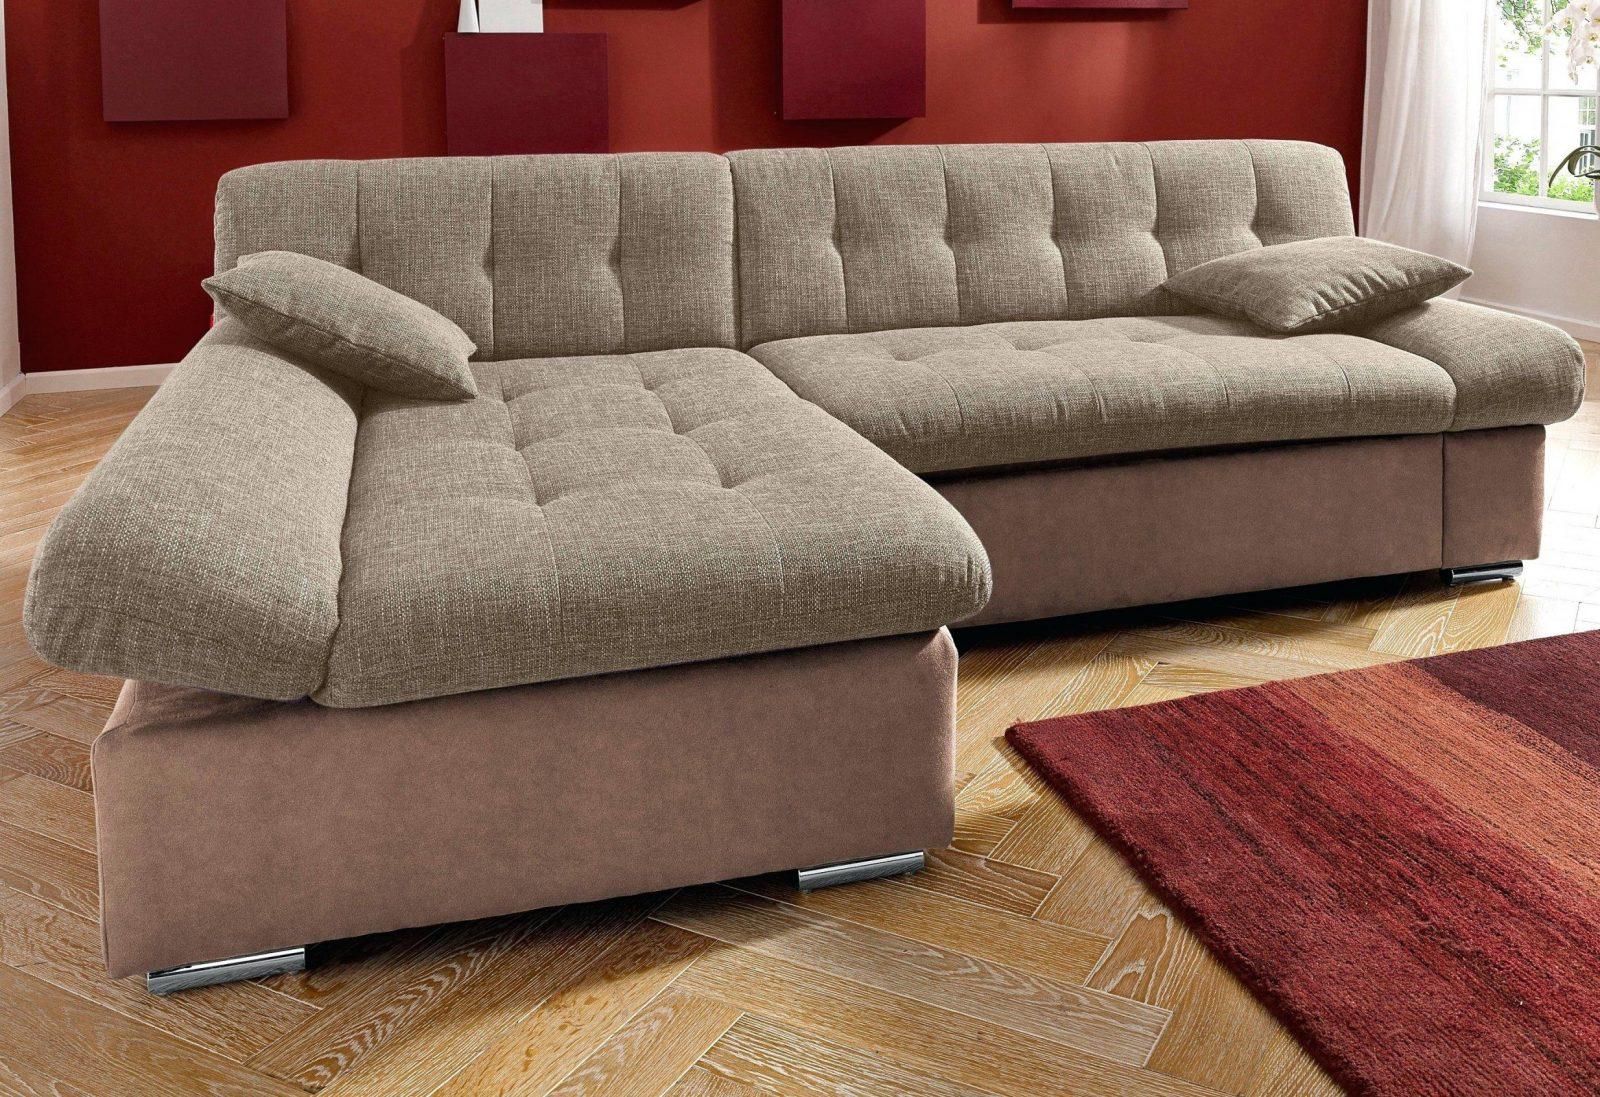 Otto Sofas Mit Bettfunktion Sofas Big Sofa Otto Sofas Mit von Otto Couch Mit Schlaffunktion Bild